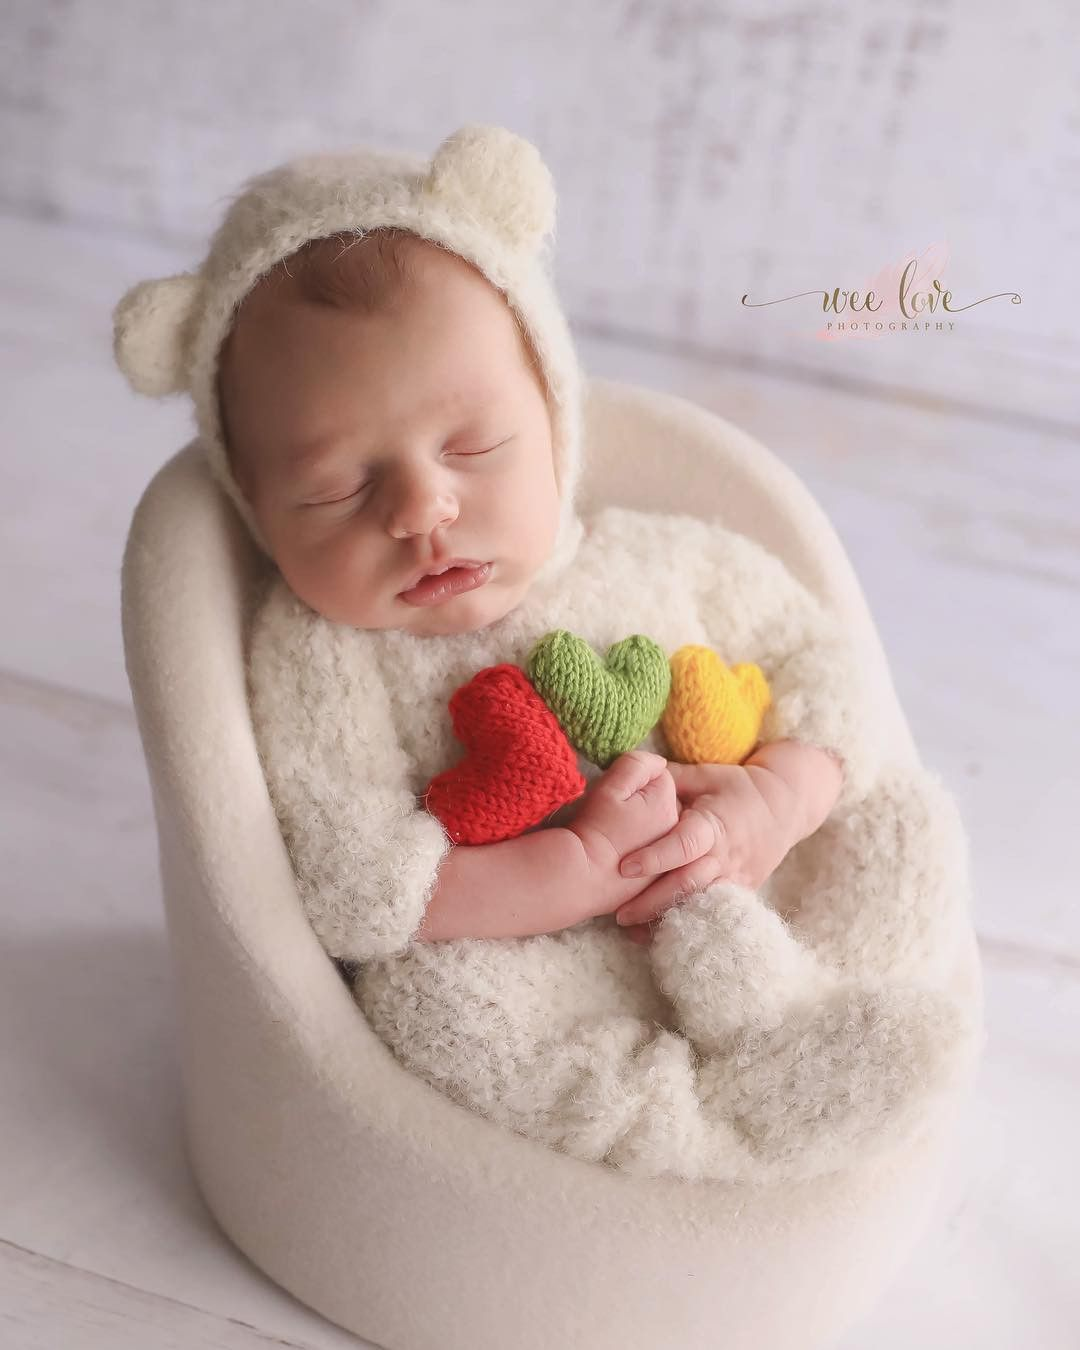 Newborn rainbow photo shoot ideas rainbow baby rainbow photo slippers photoshoot ideas